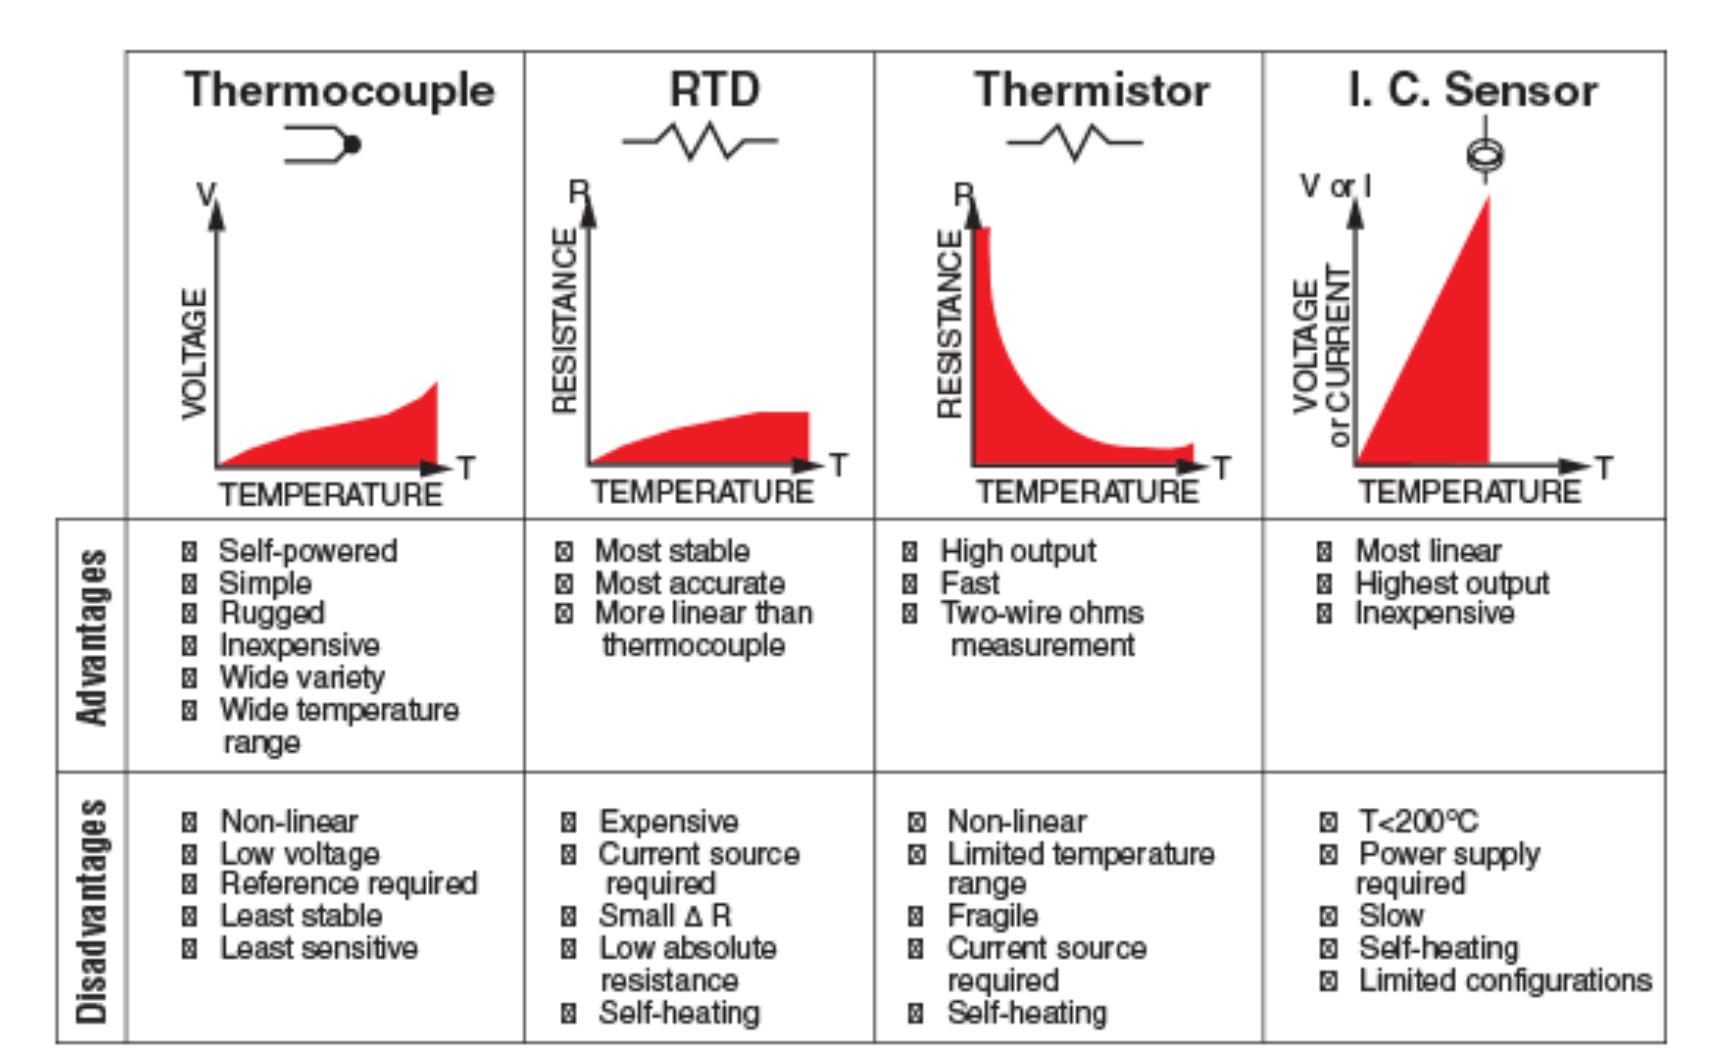 LM35 Temperature Sensor Principle - Temperature Measurement